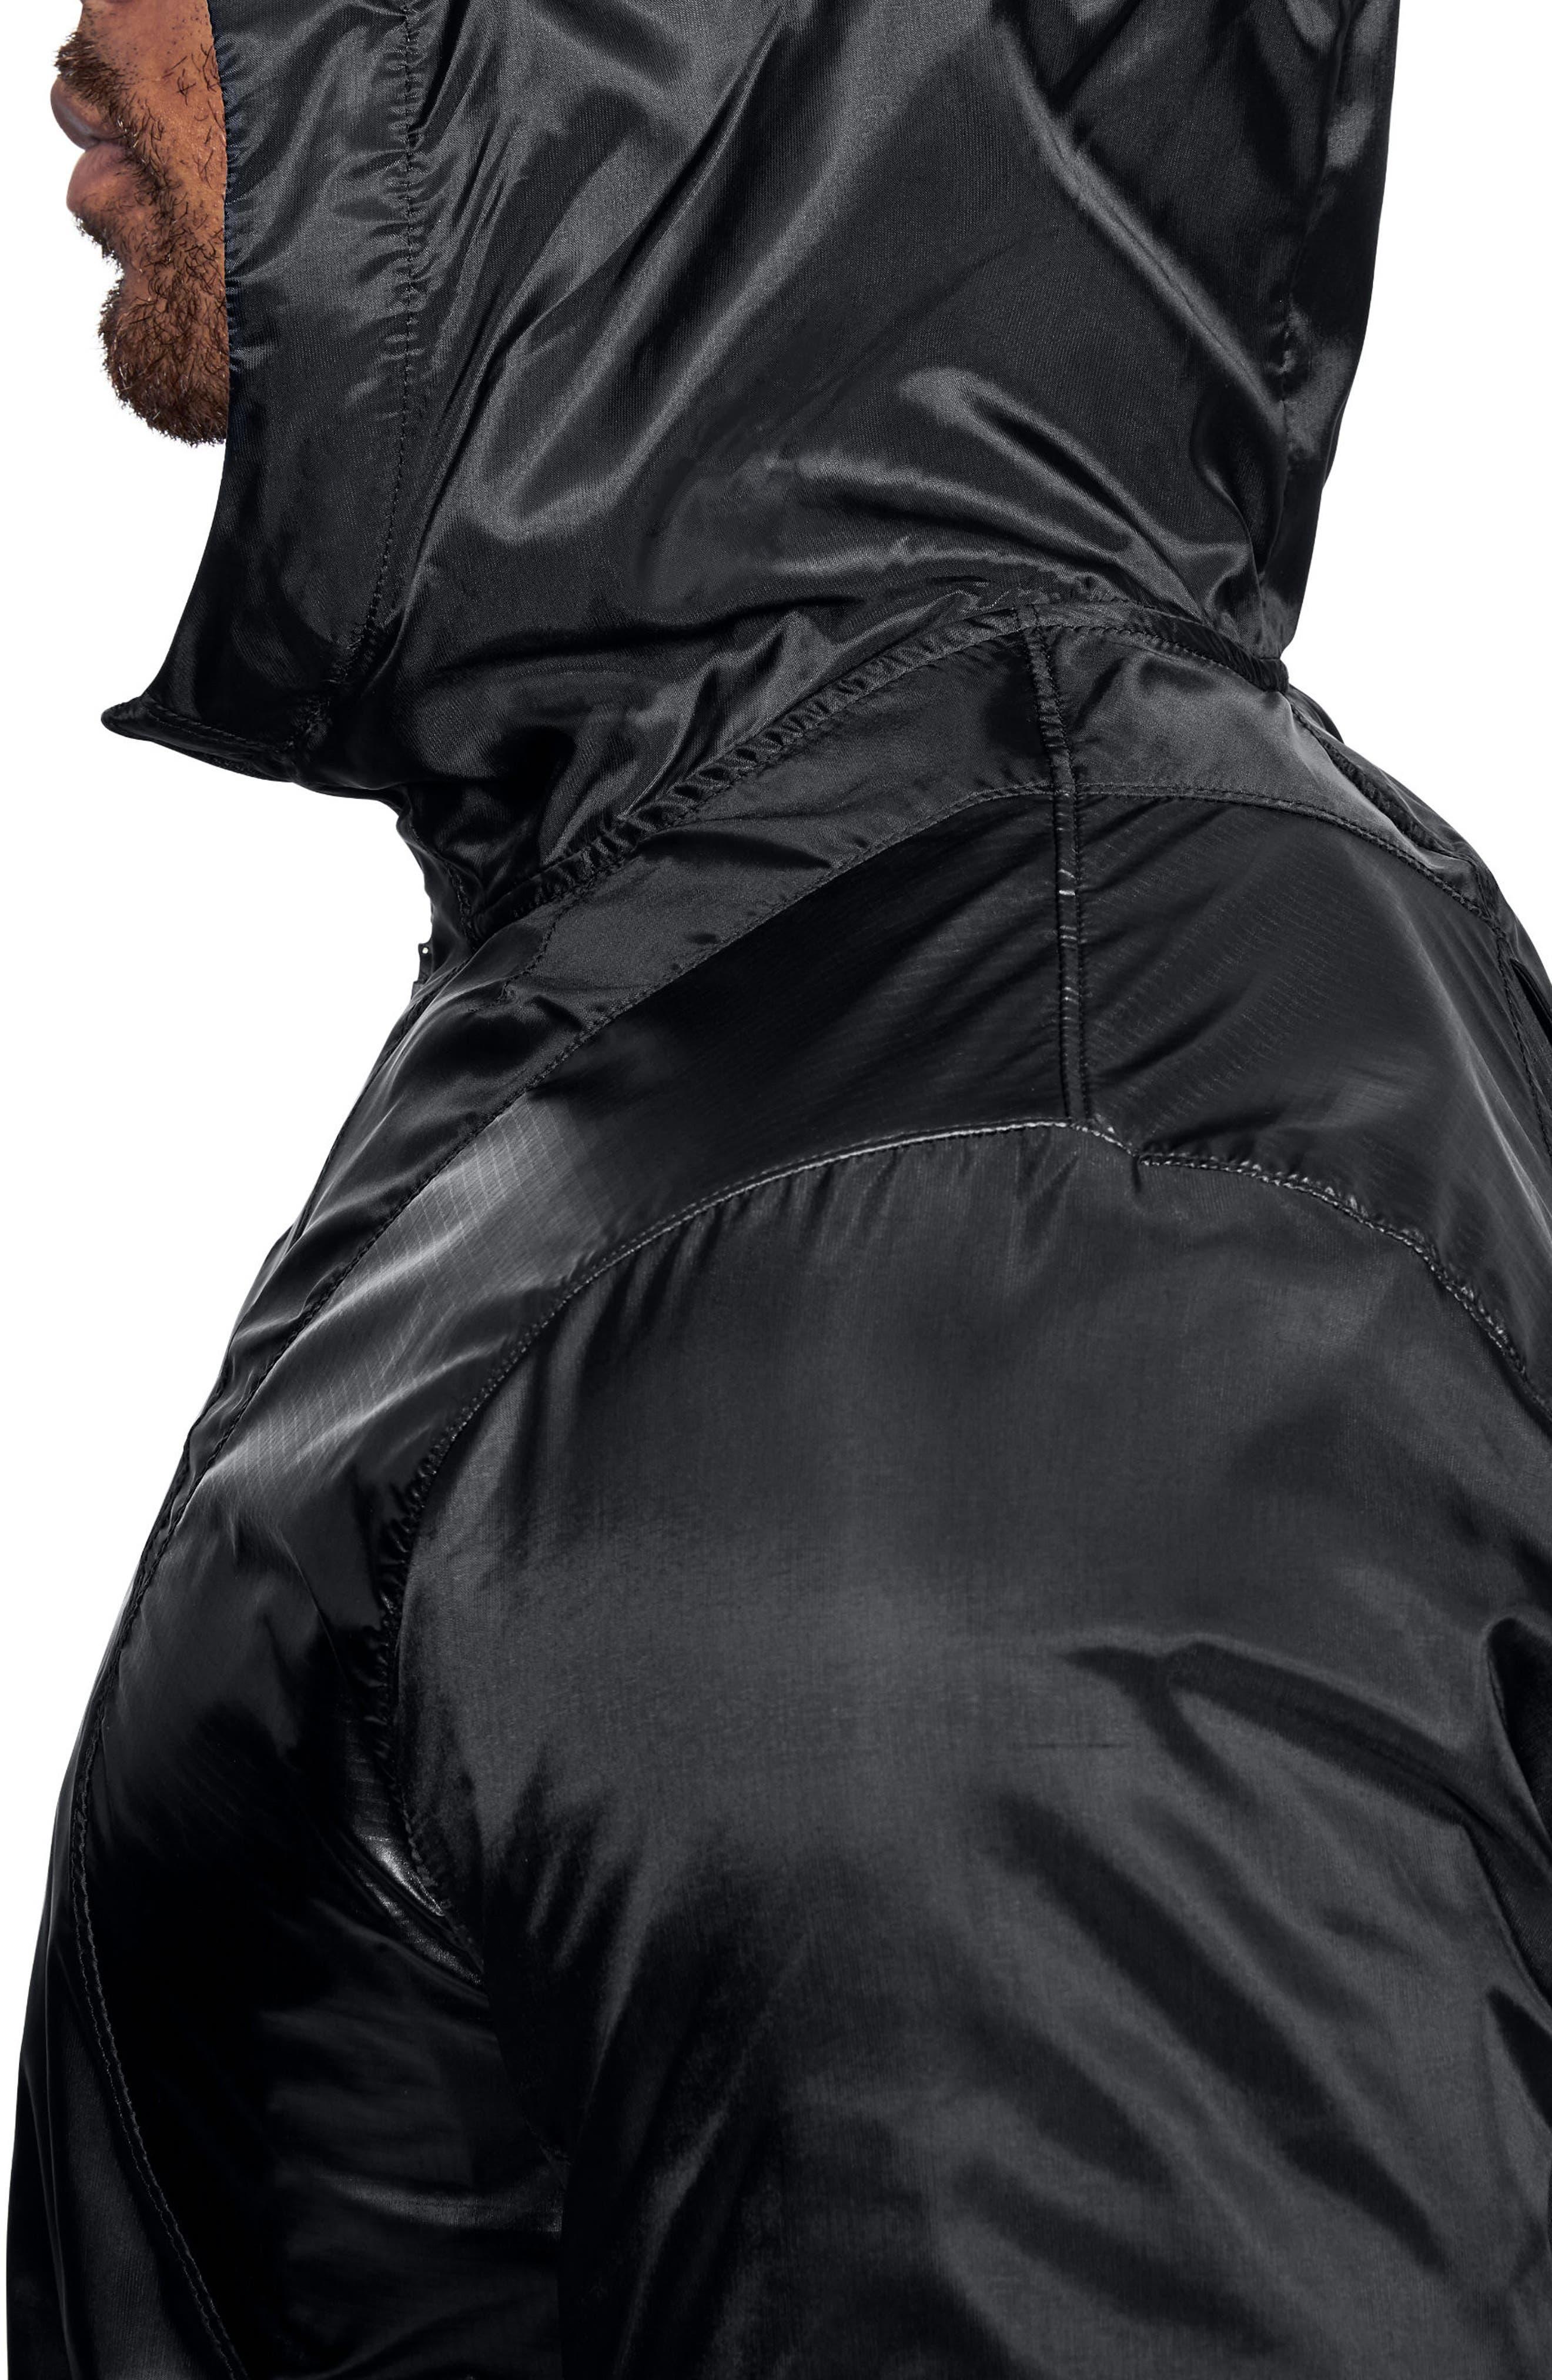 Perpetual Windproof & Water Resistant Hooded Jacket,                             Alternate thumbnail 3, color,                             BLACK/ METALLIC VICTORY GOLD